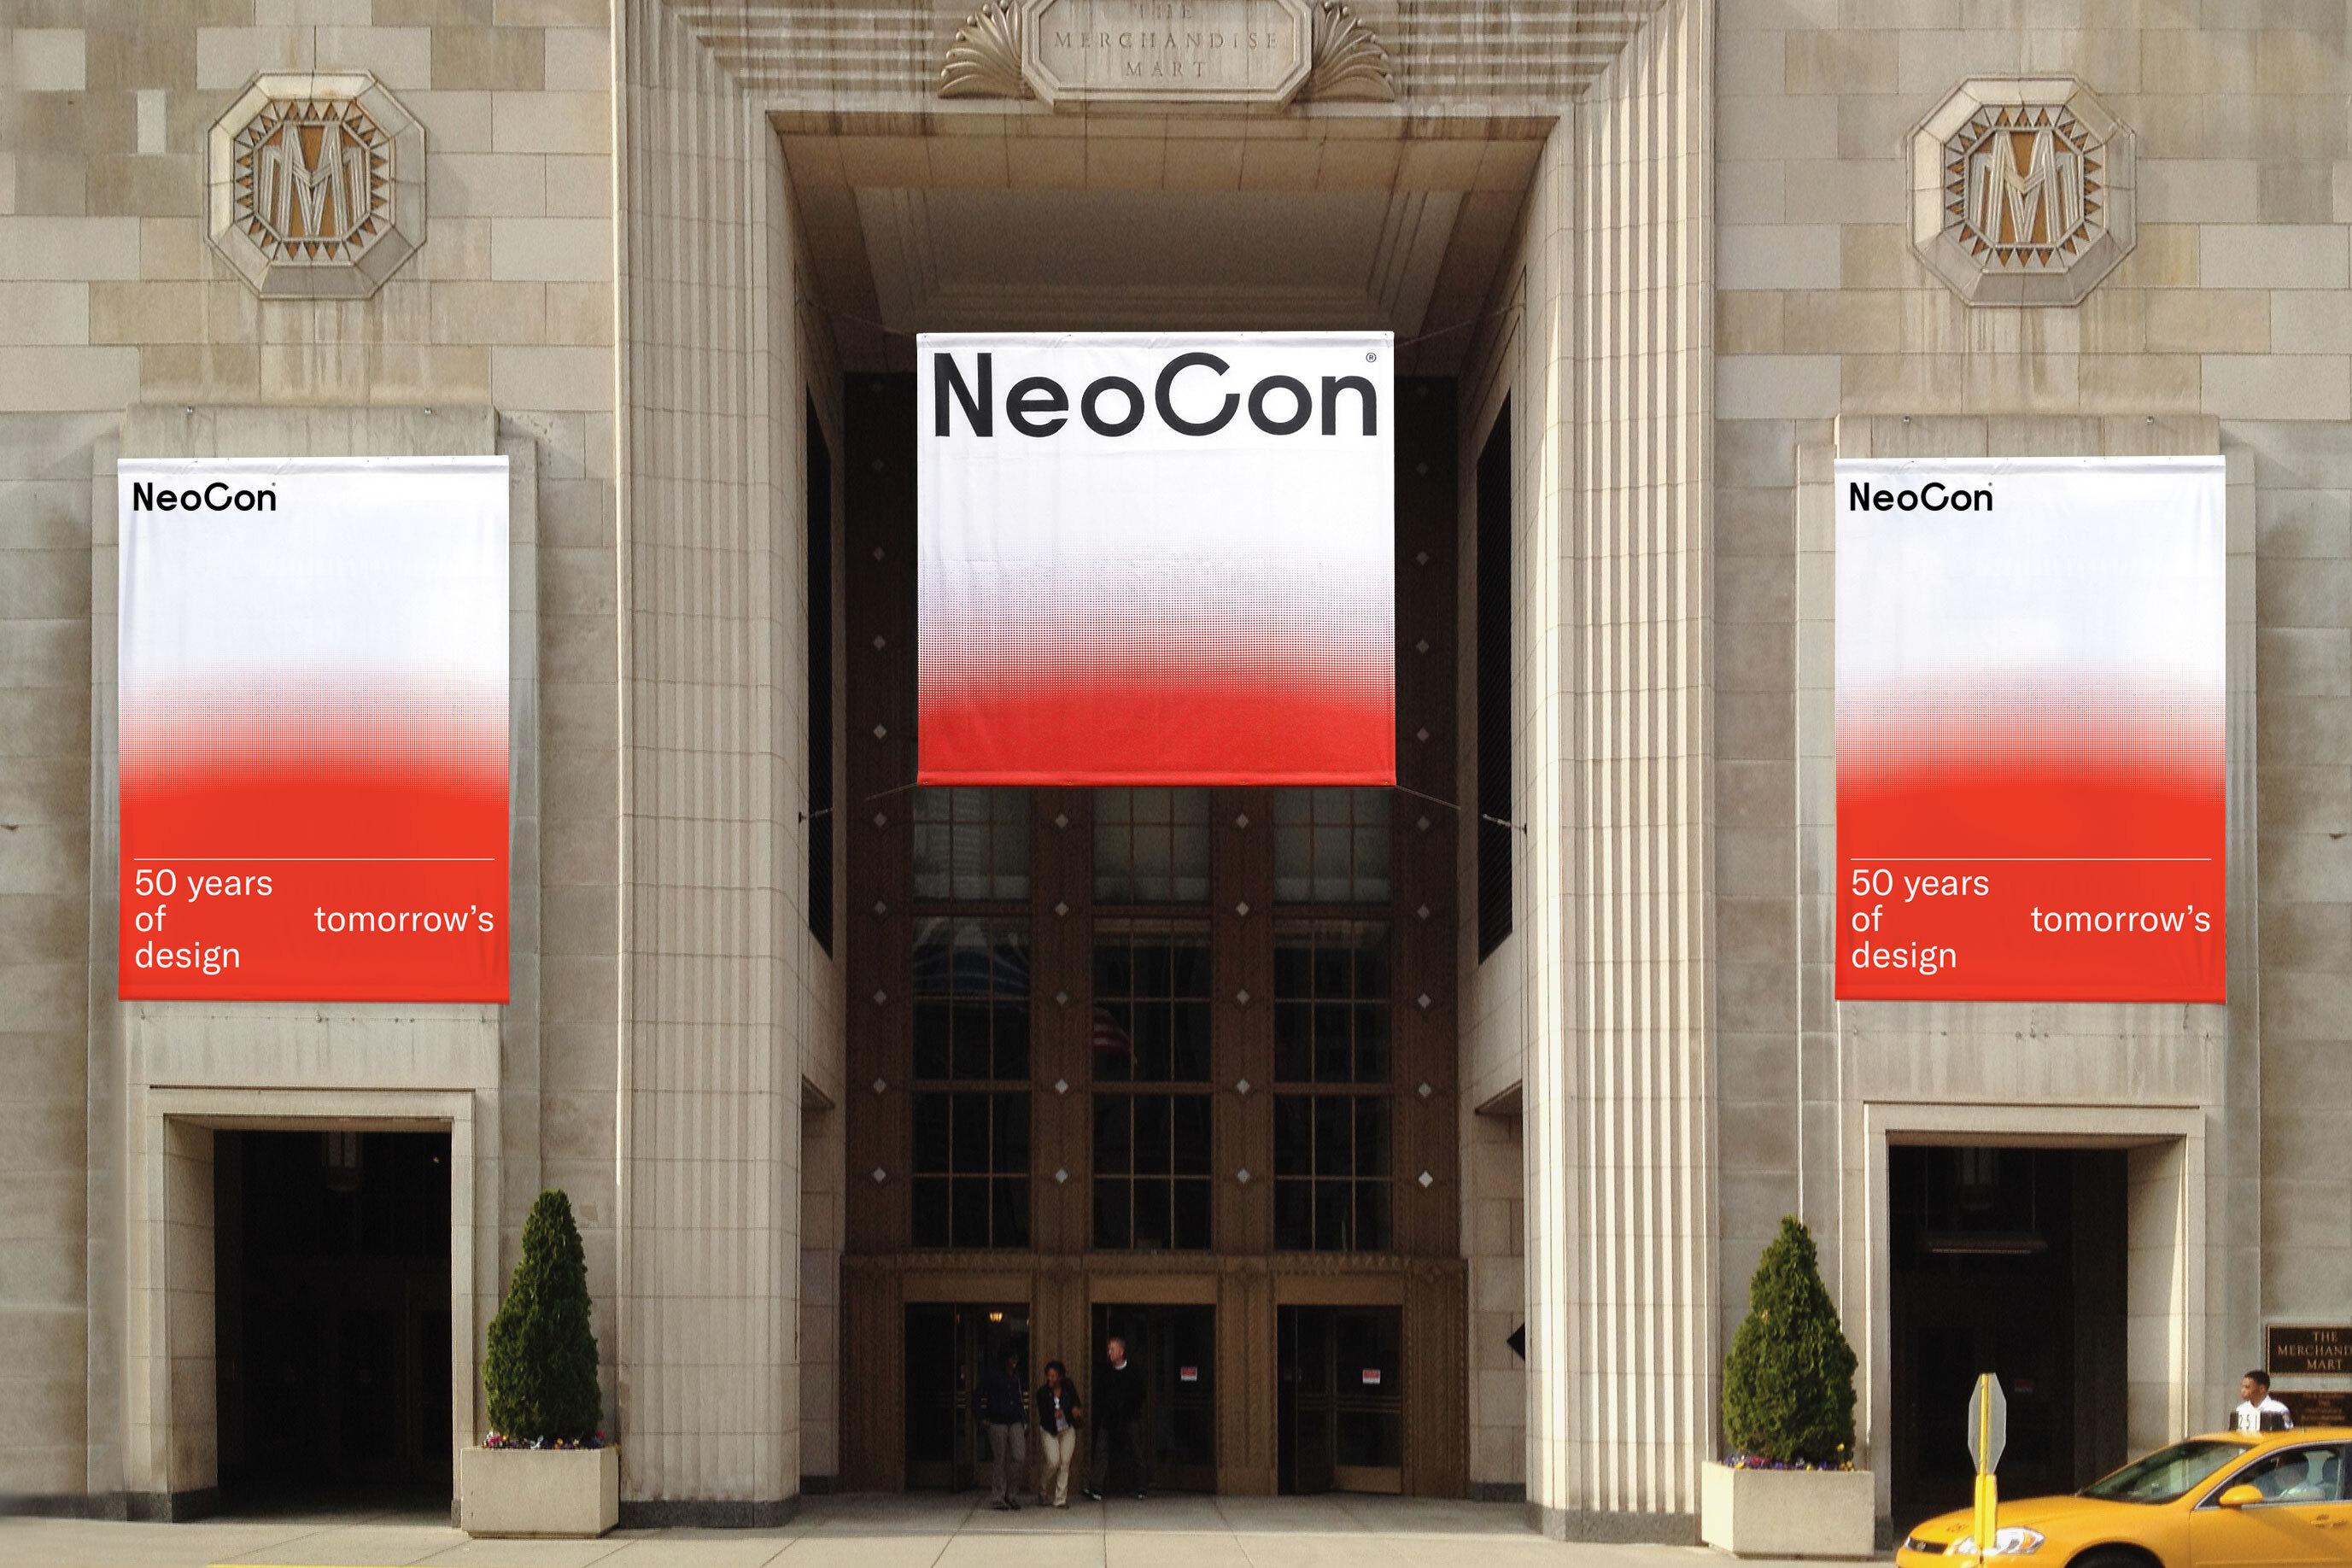 Neocon signage ext 3 2